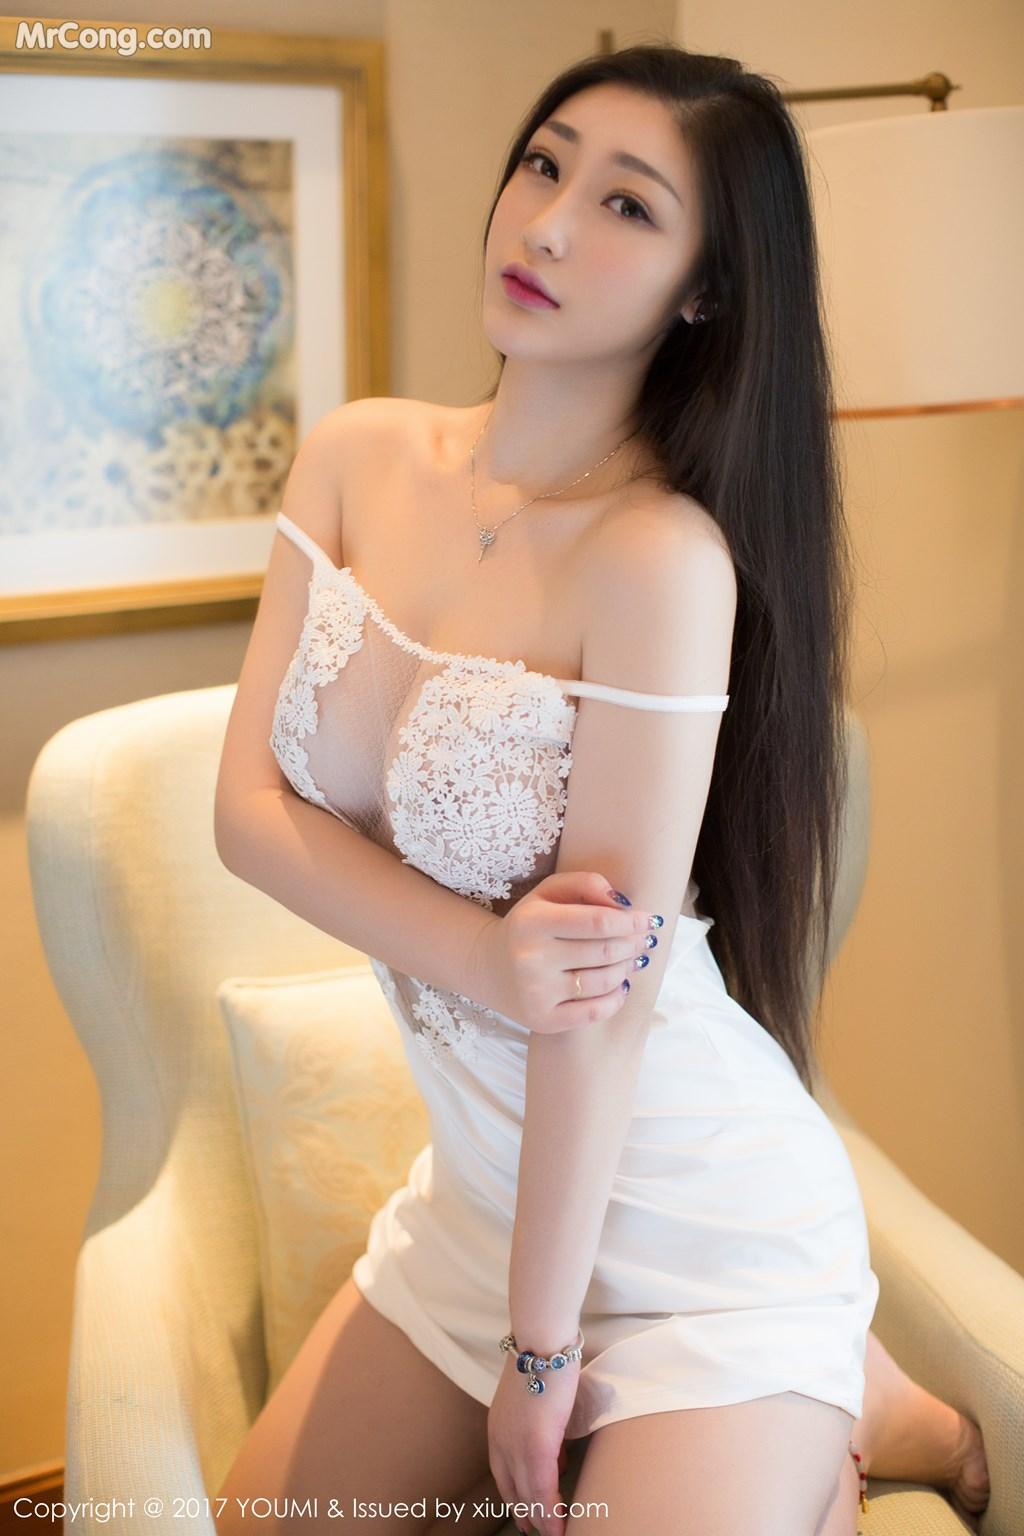 Image YouMi-Vol.077-Daji-Toxic-MrCong.com-033 in post YouMi Vol.077: Người mẫu Daji_Toxic (妲己_Toxic) (49 ảnh)